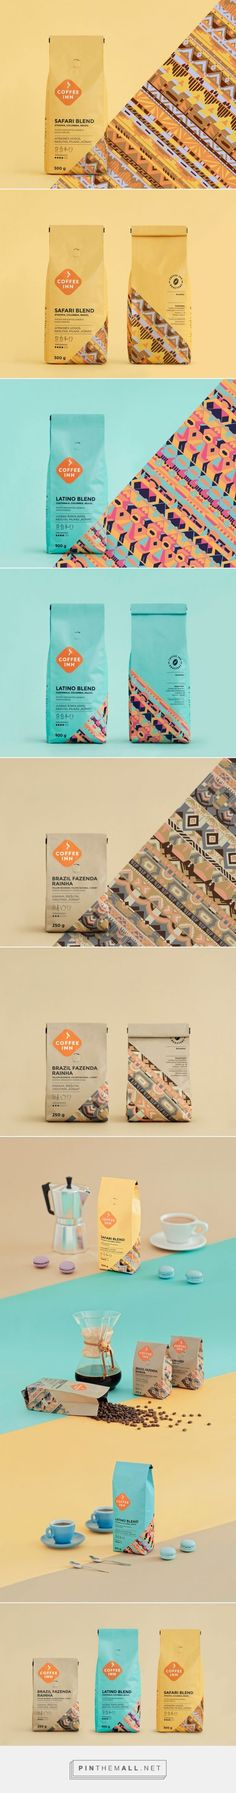 Coffee Inn - Packaging of the World - Creative Package Design Gallery - http://www.packagingoftheworld.com/2016/08/coffee-inn.html